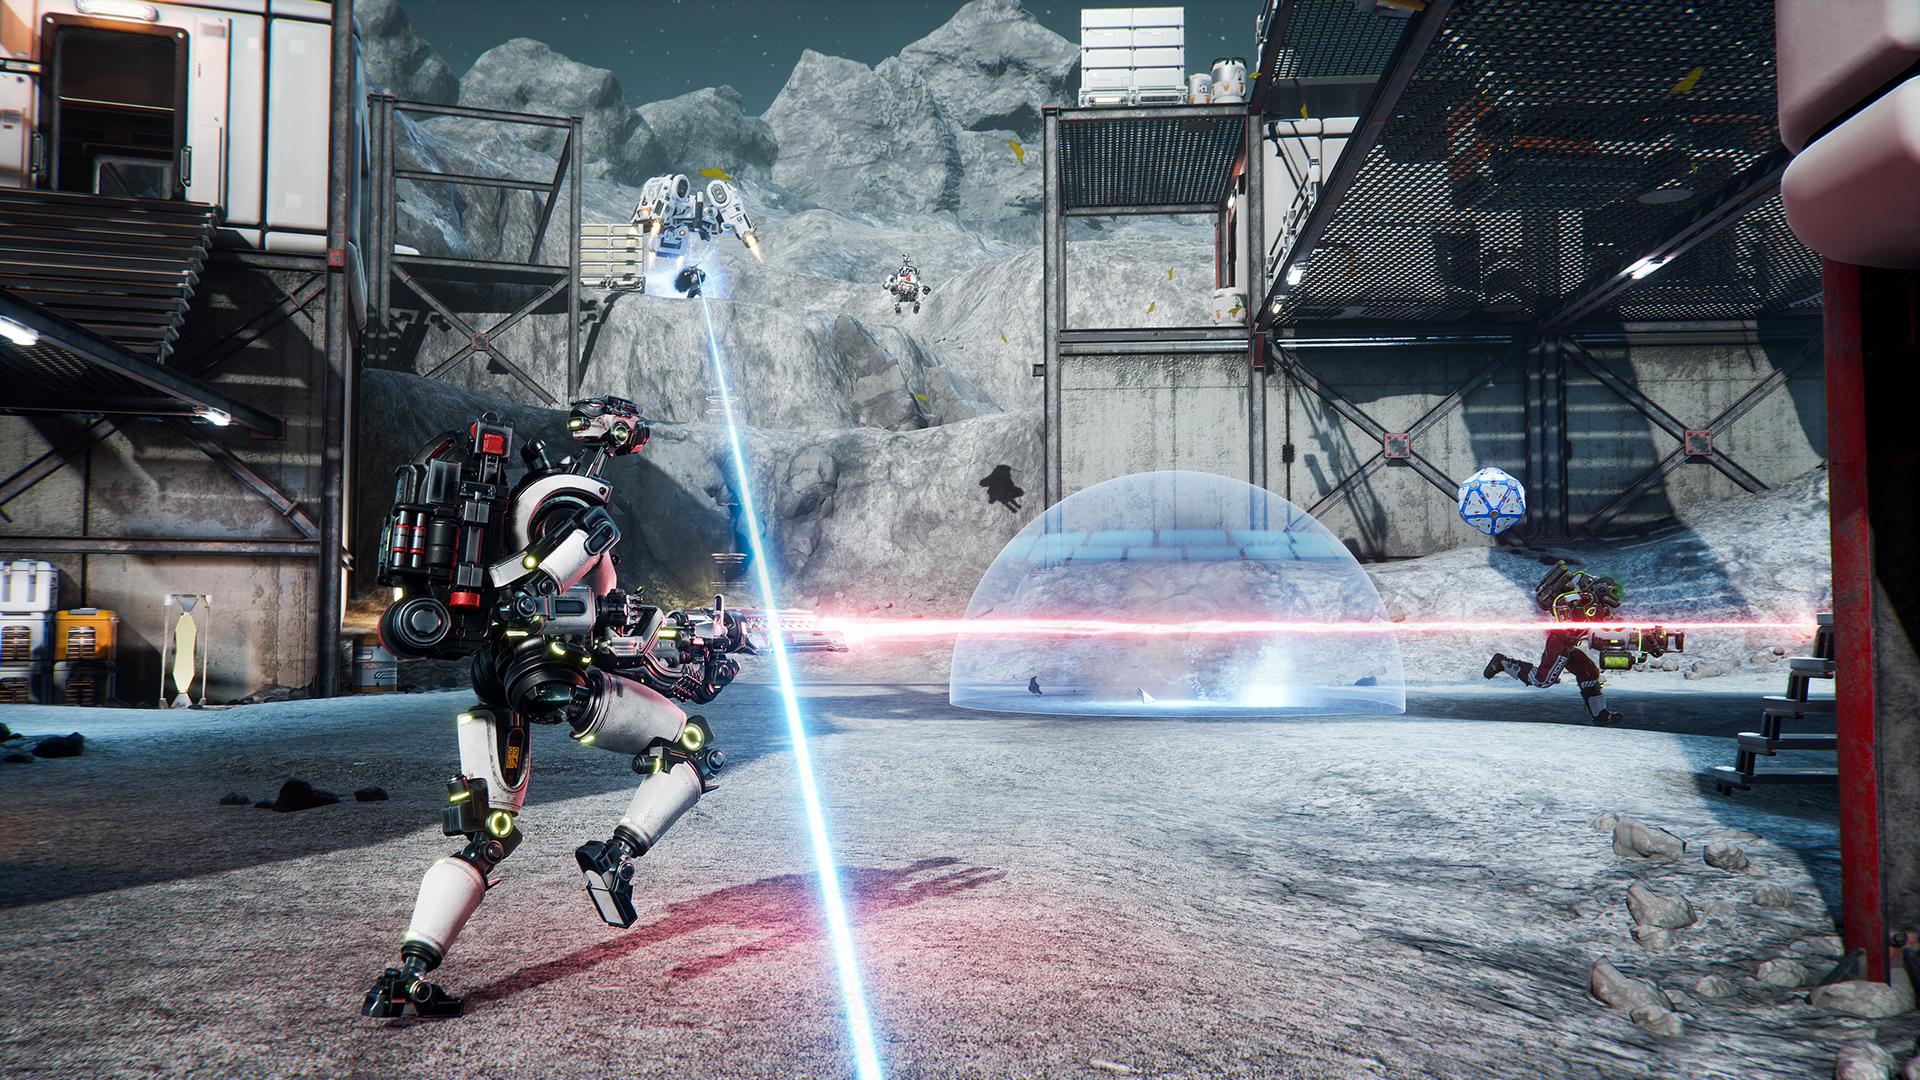 Lemnis Gate is a galaxy-brain shooter stuck in a time loop screenshot